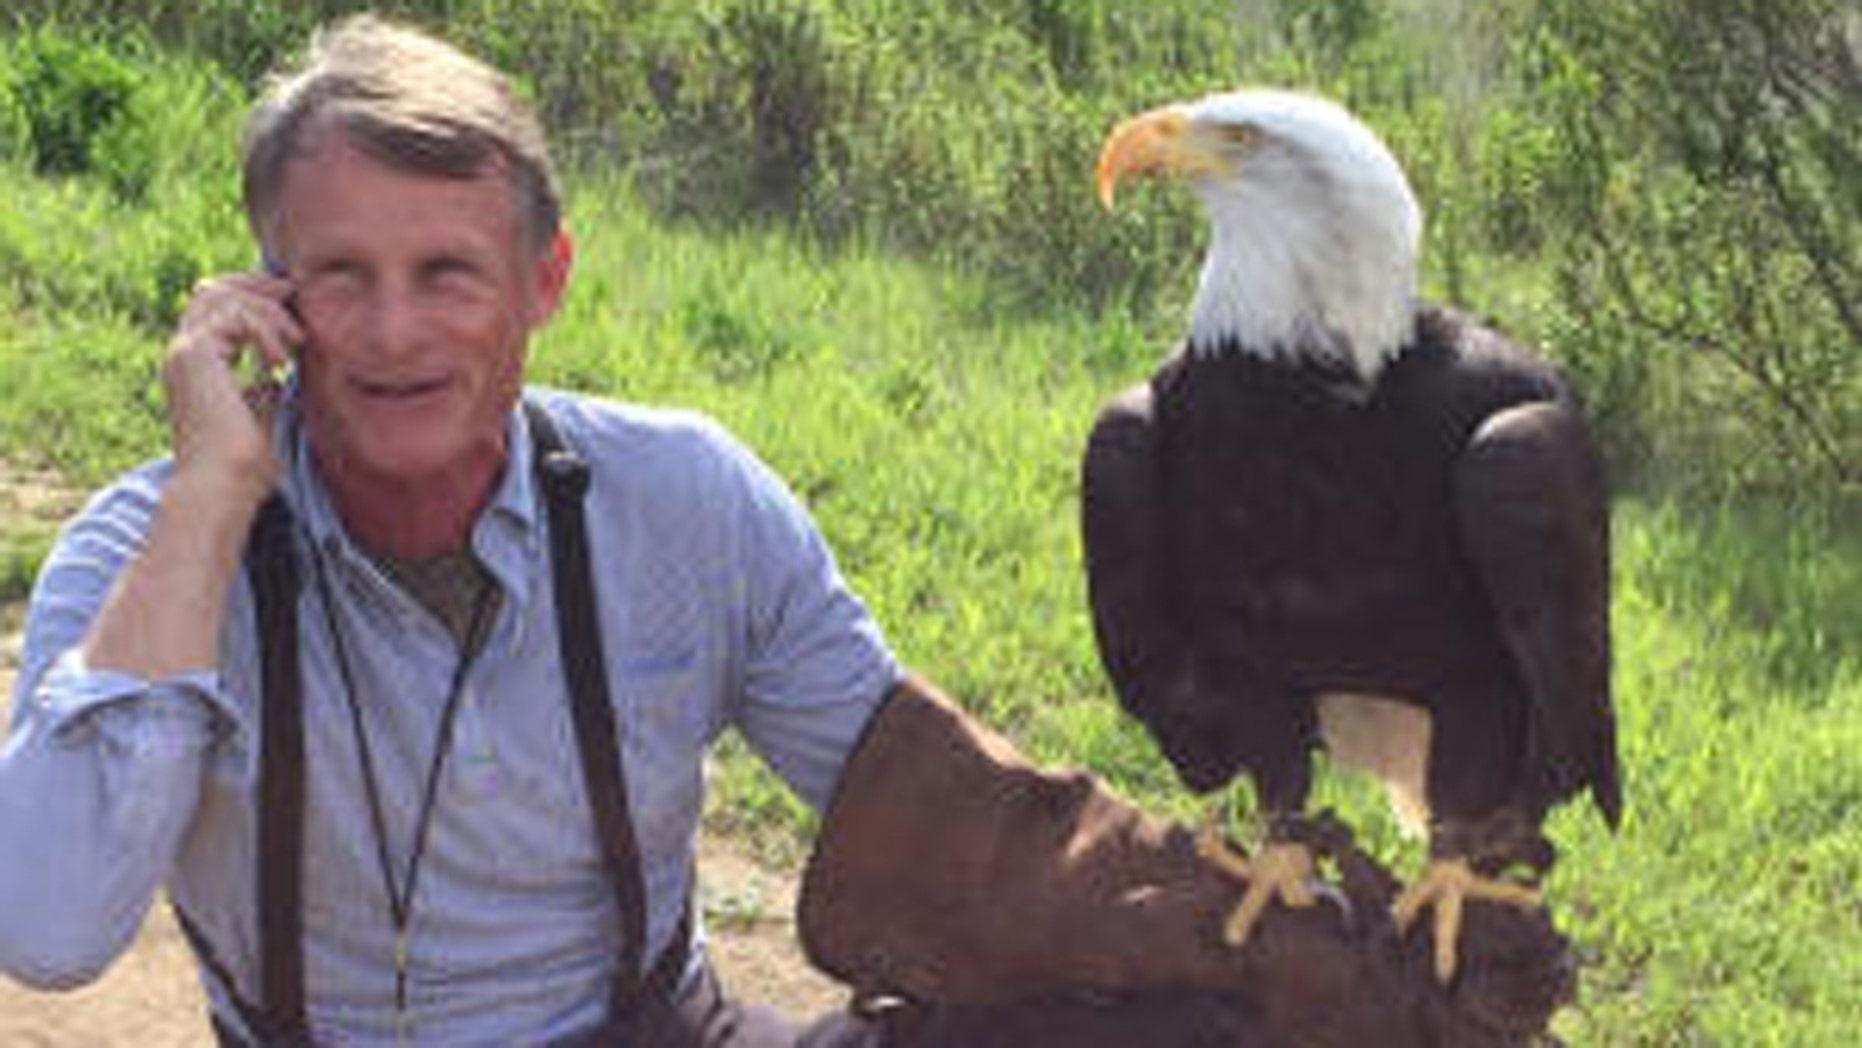 Photo shows Sequoia bald eagle and Palo Alto Junior Museum and Zoo director John Aikin. (Palo Alto Junior Museum & Zoo)